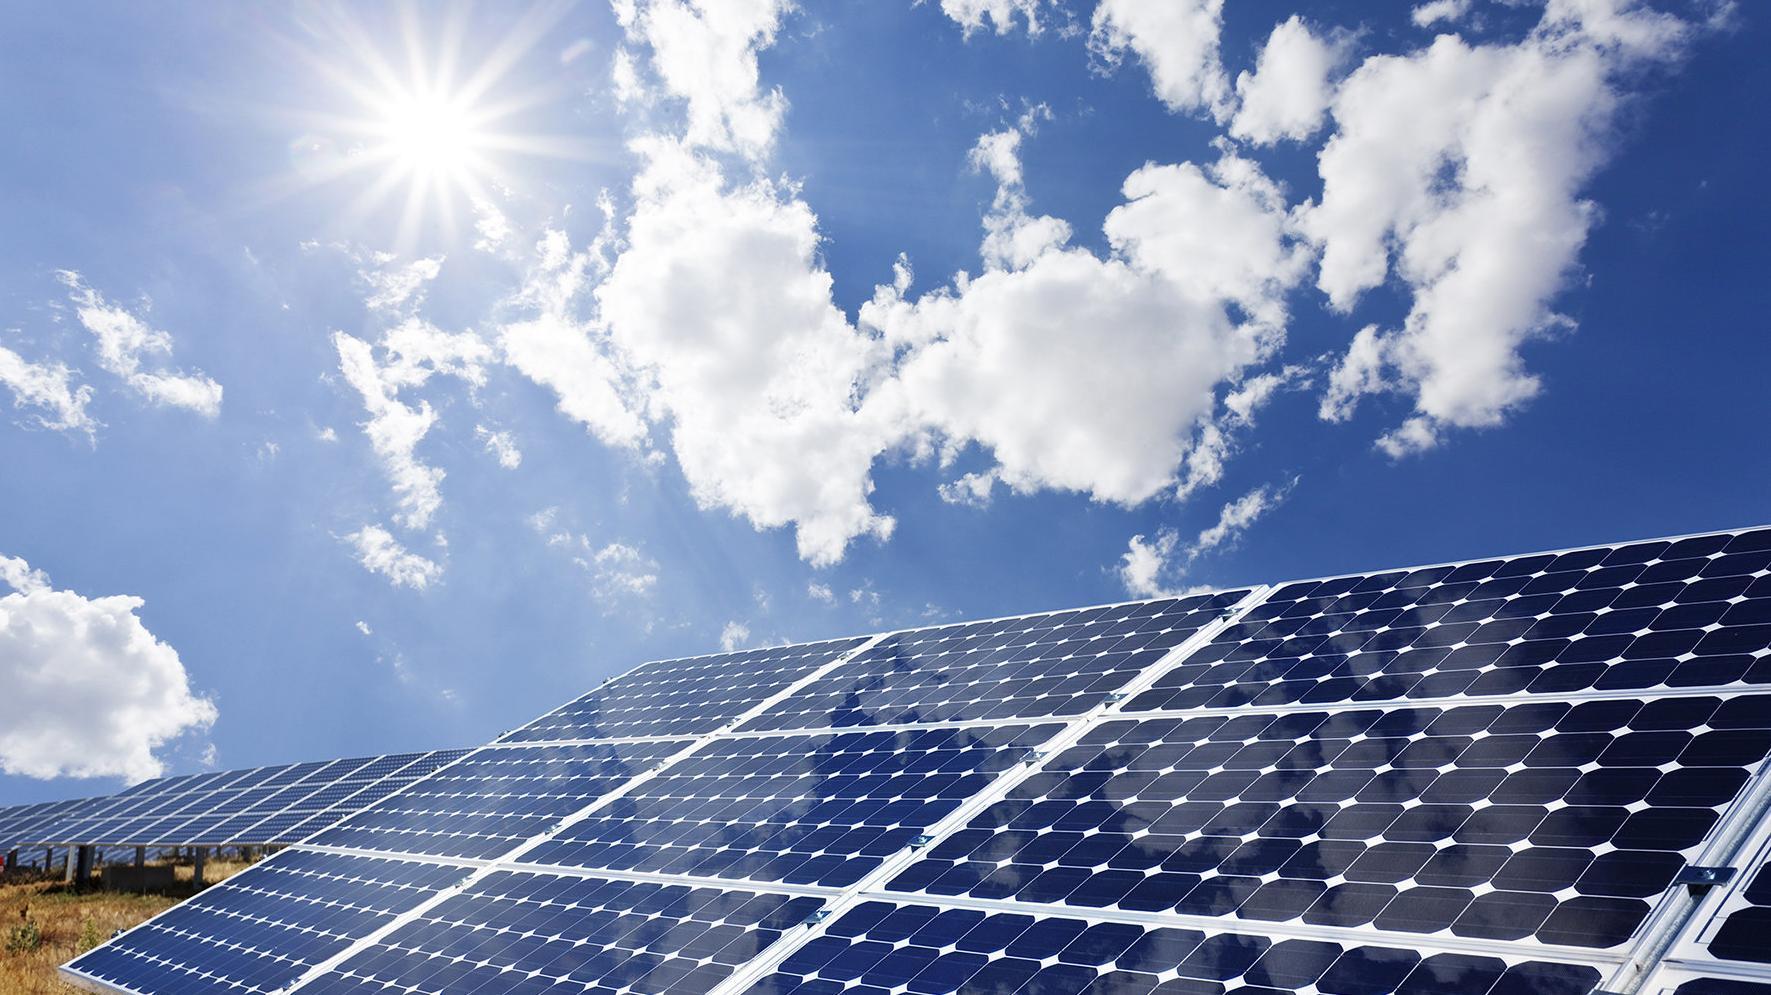 Solaranlagen auf Feld